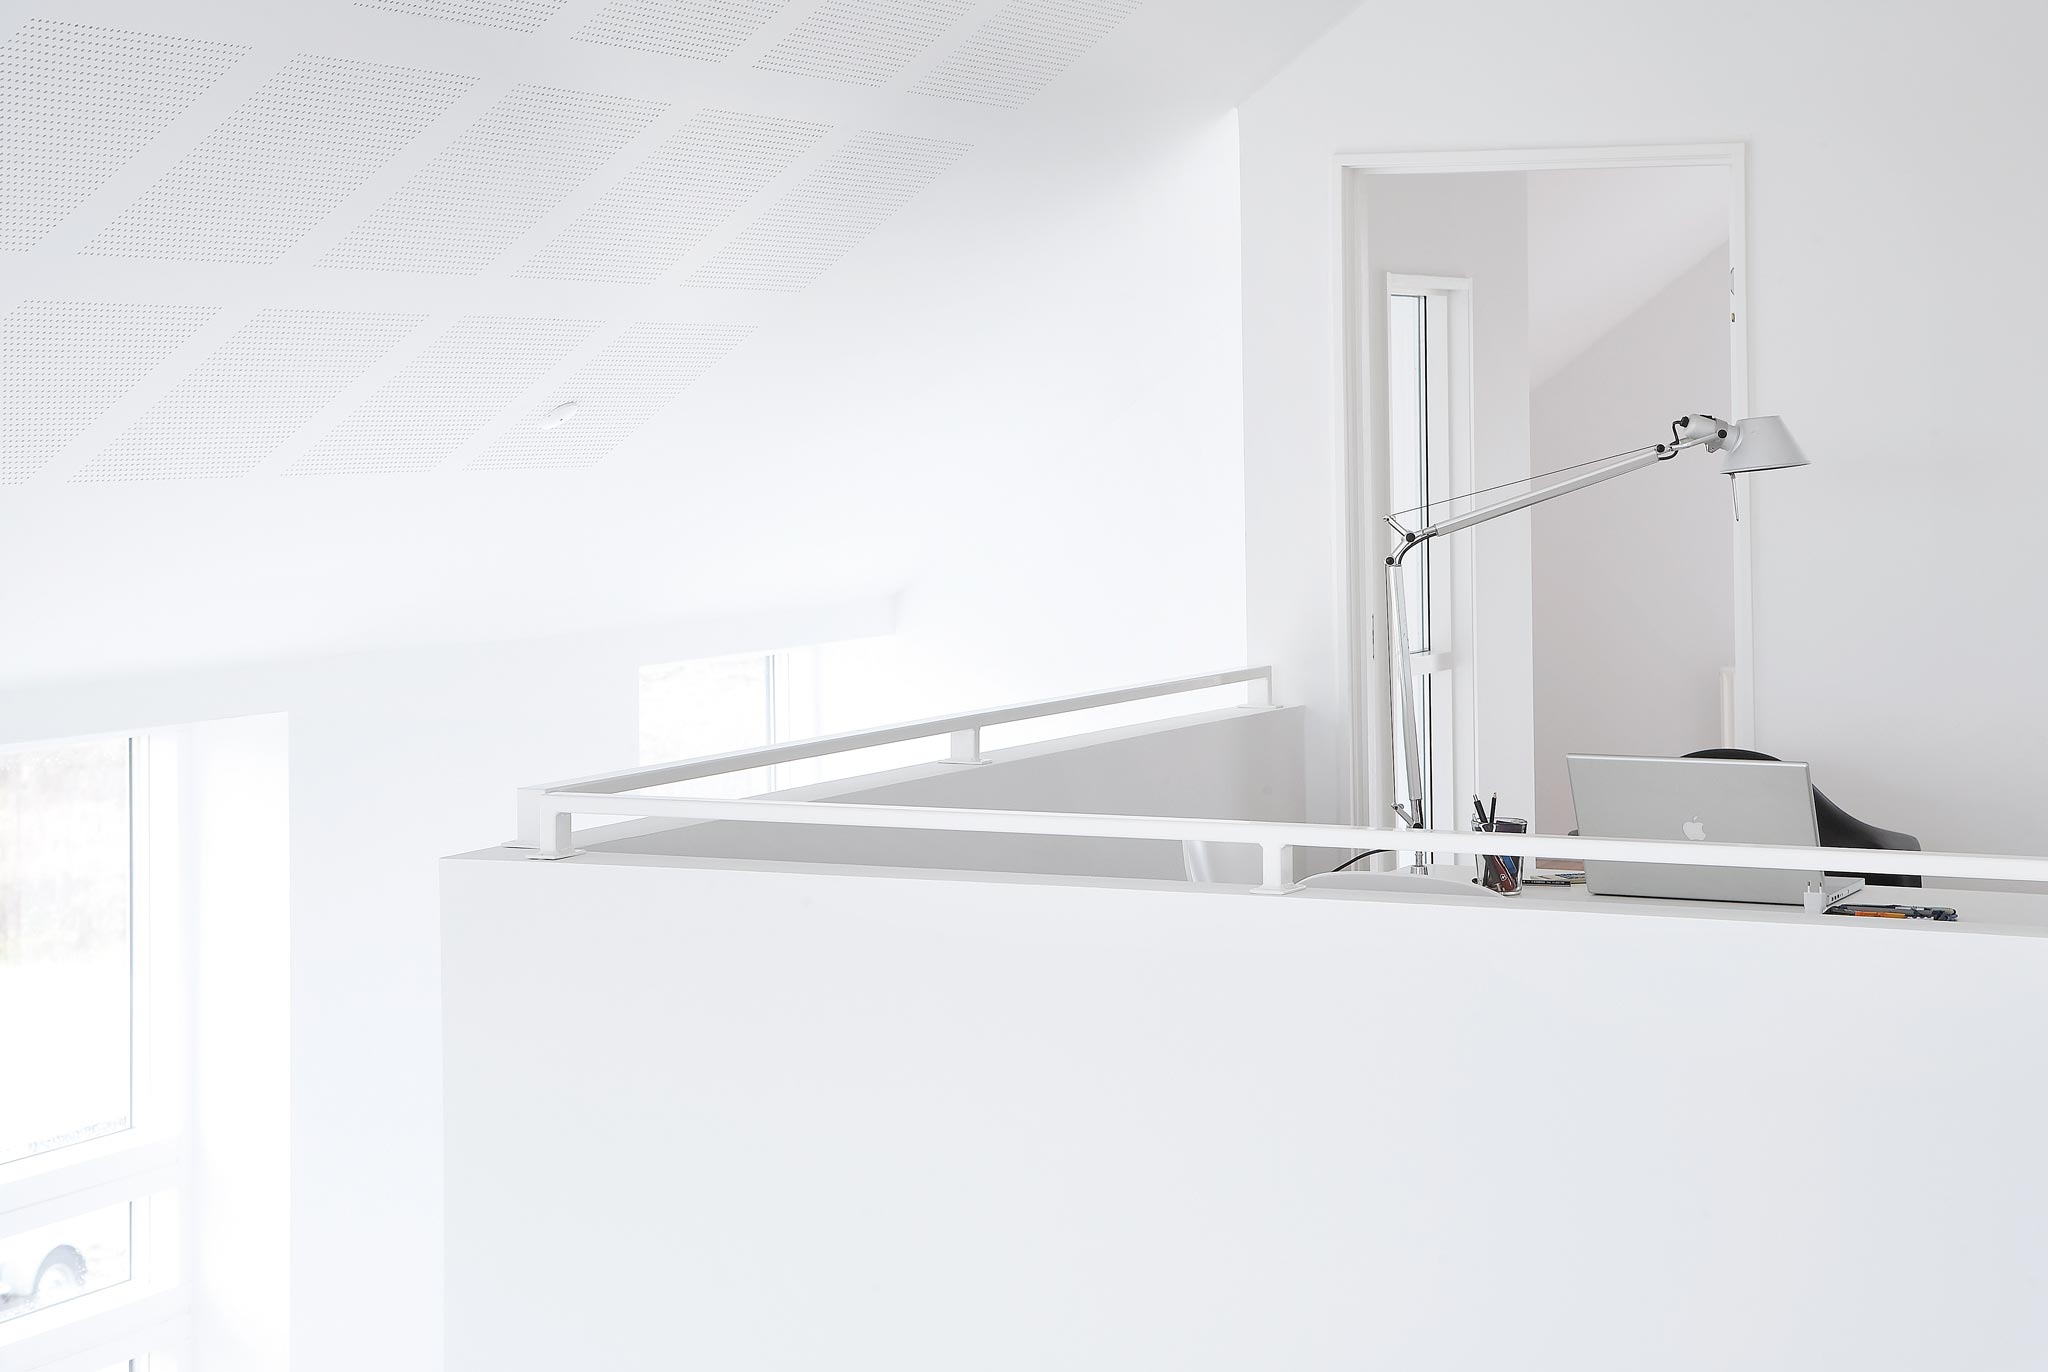 oneroom_arkitekttegnet_in_03.jpeg